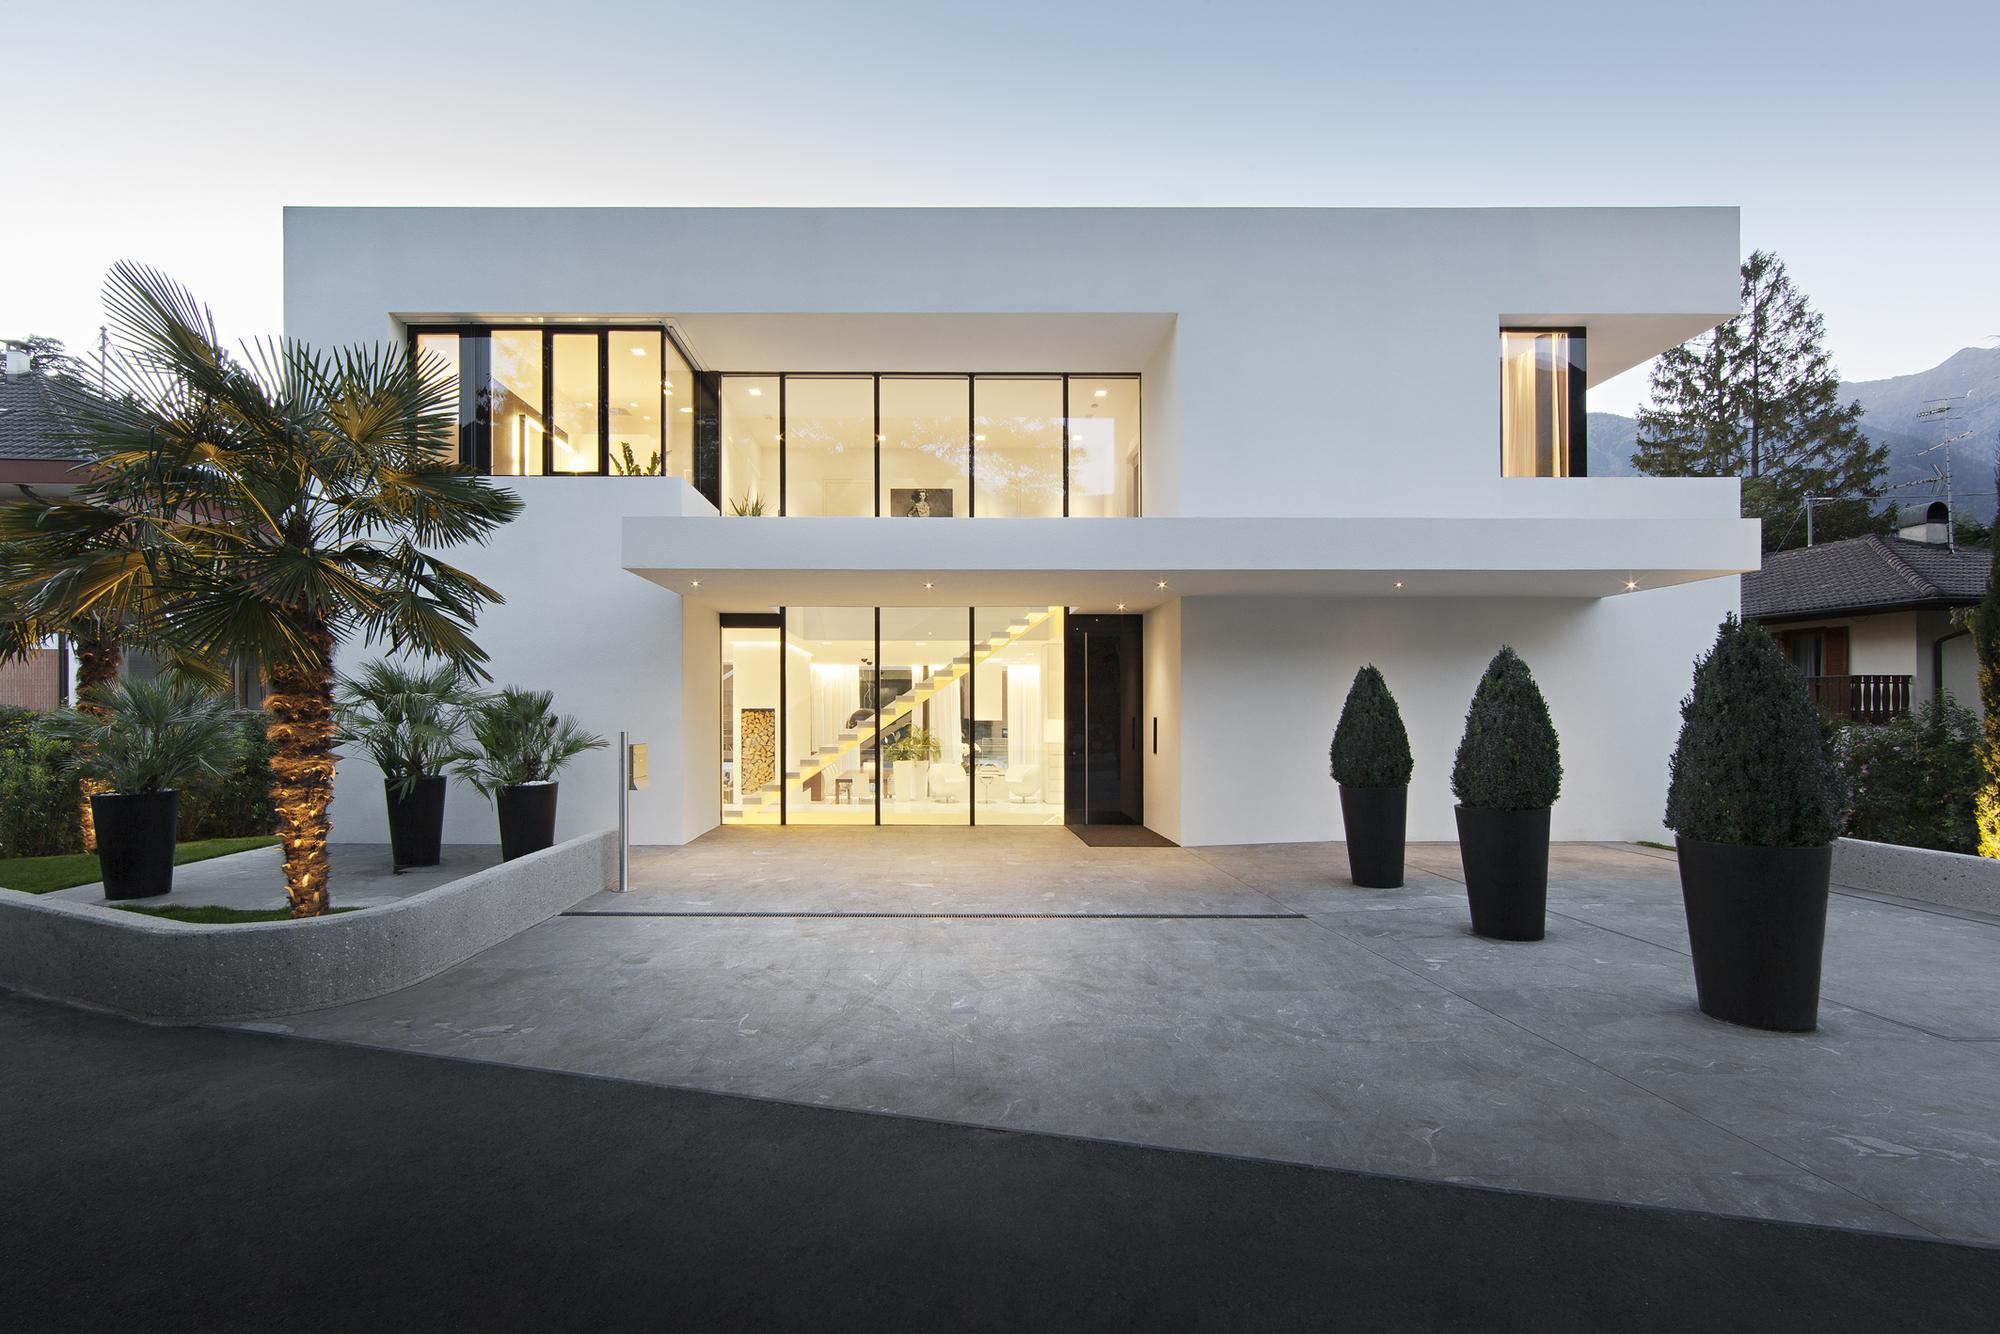 House M – Monovolume rchitecture + Design – owboyZoom size: 2000 x 1334 post ID: 7 File size: 0 B